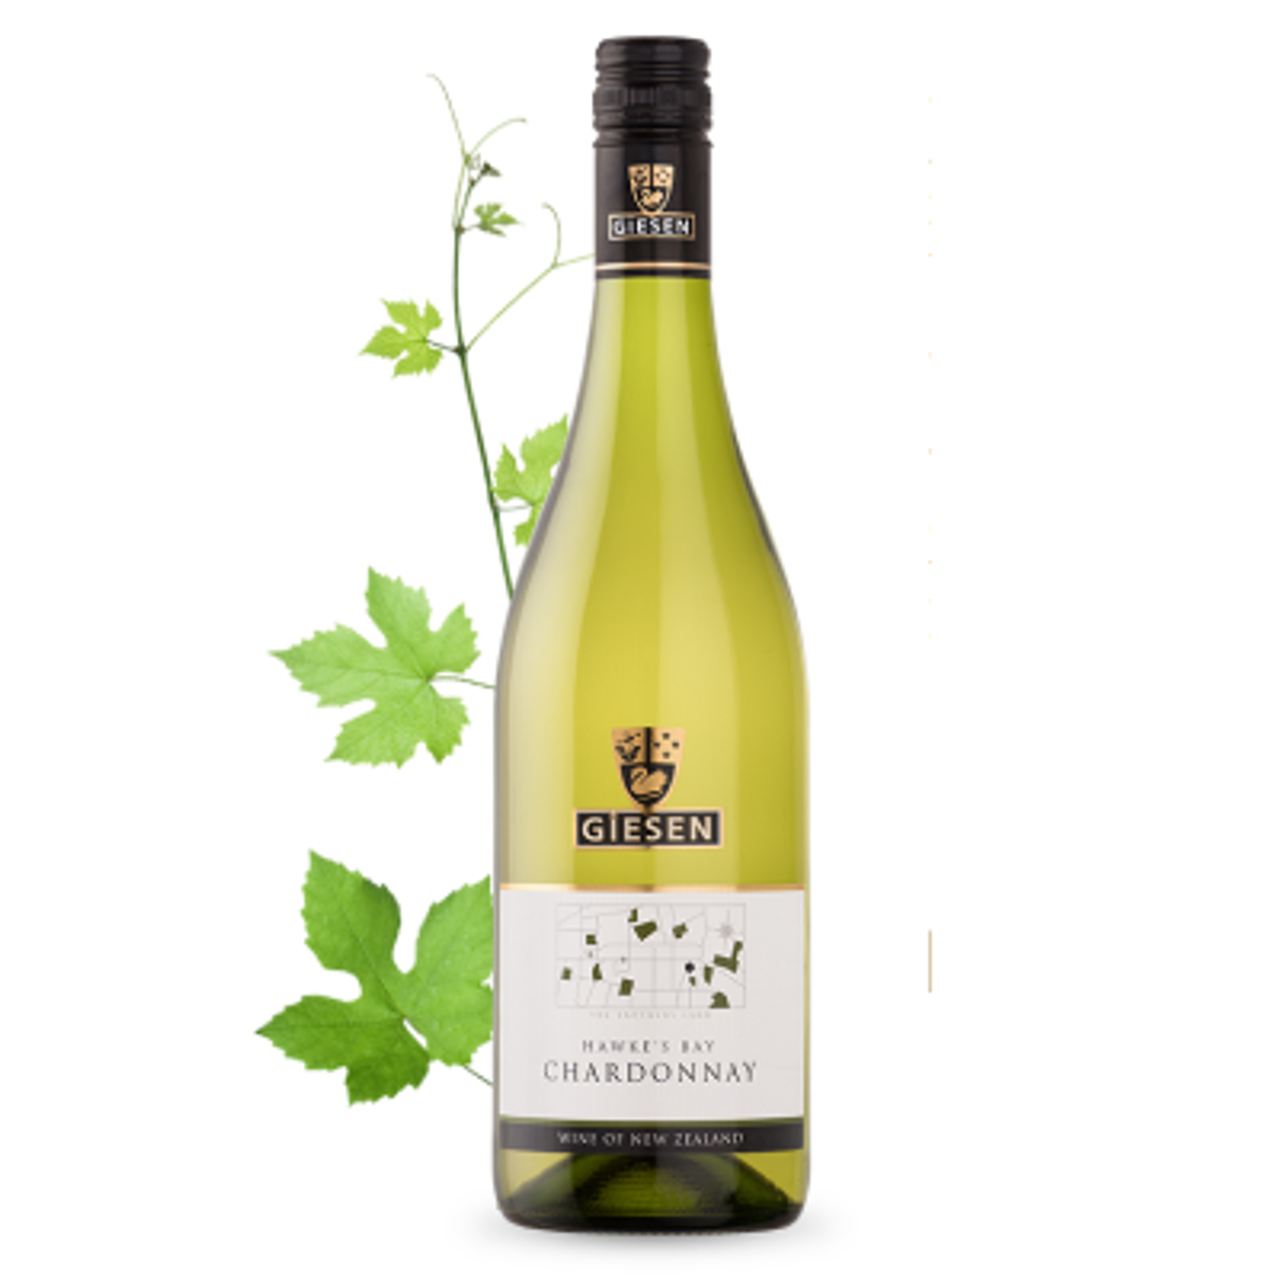 New Zealand Chardonnay